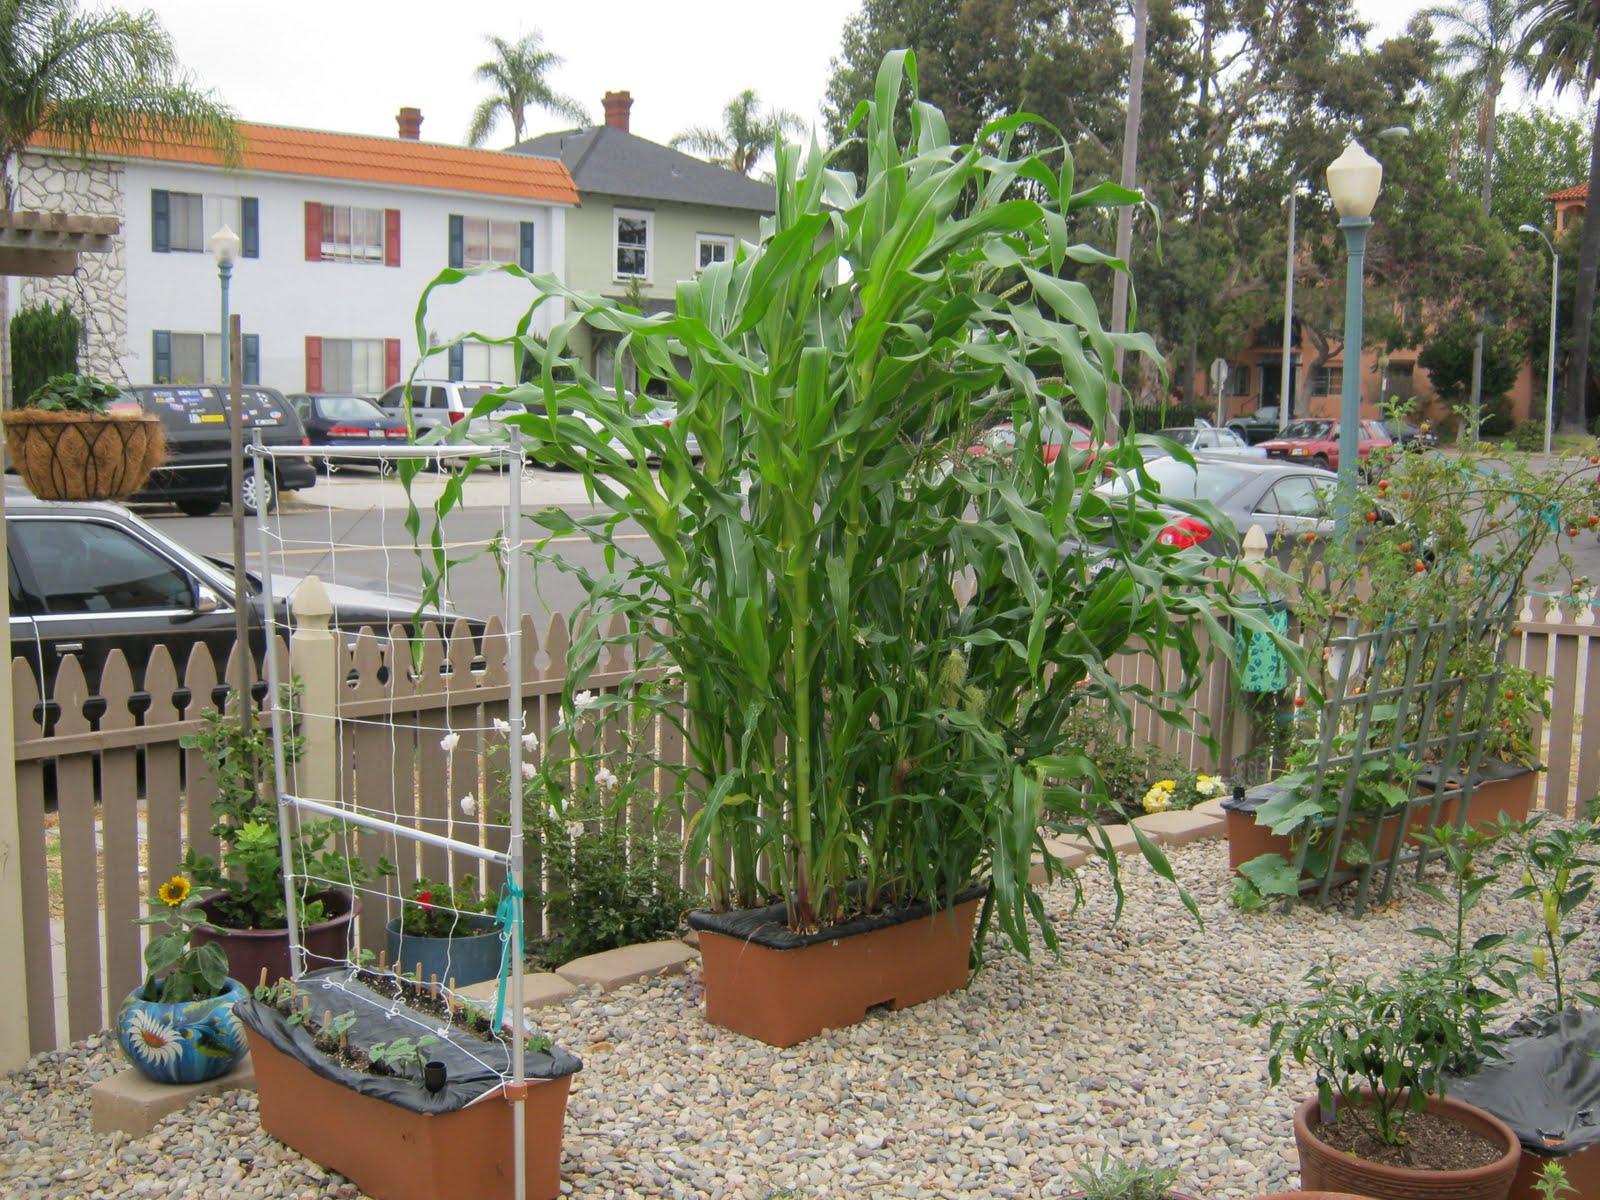 Gidget's Garden: Pollinating Corn